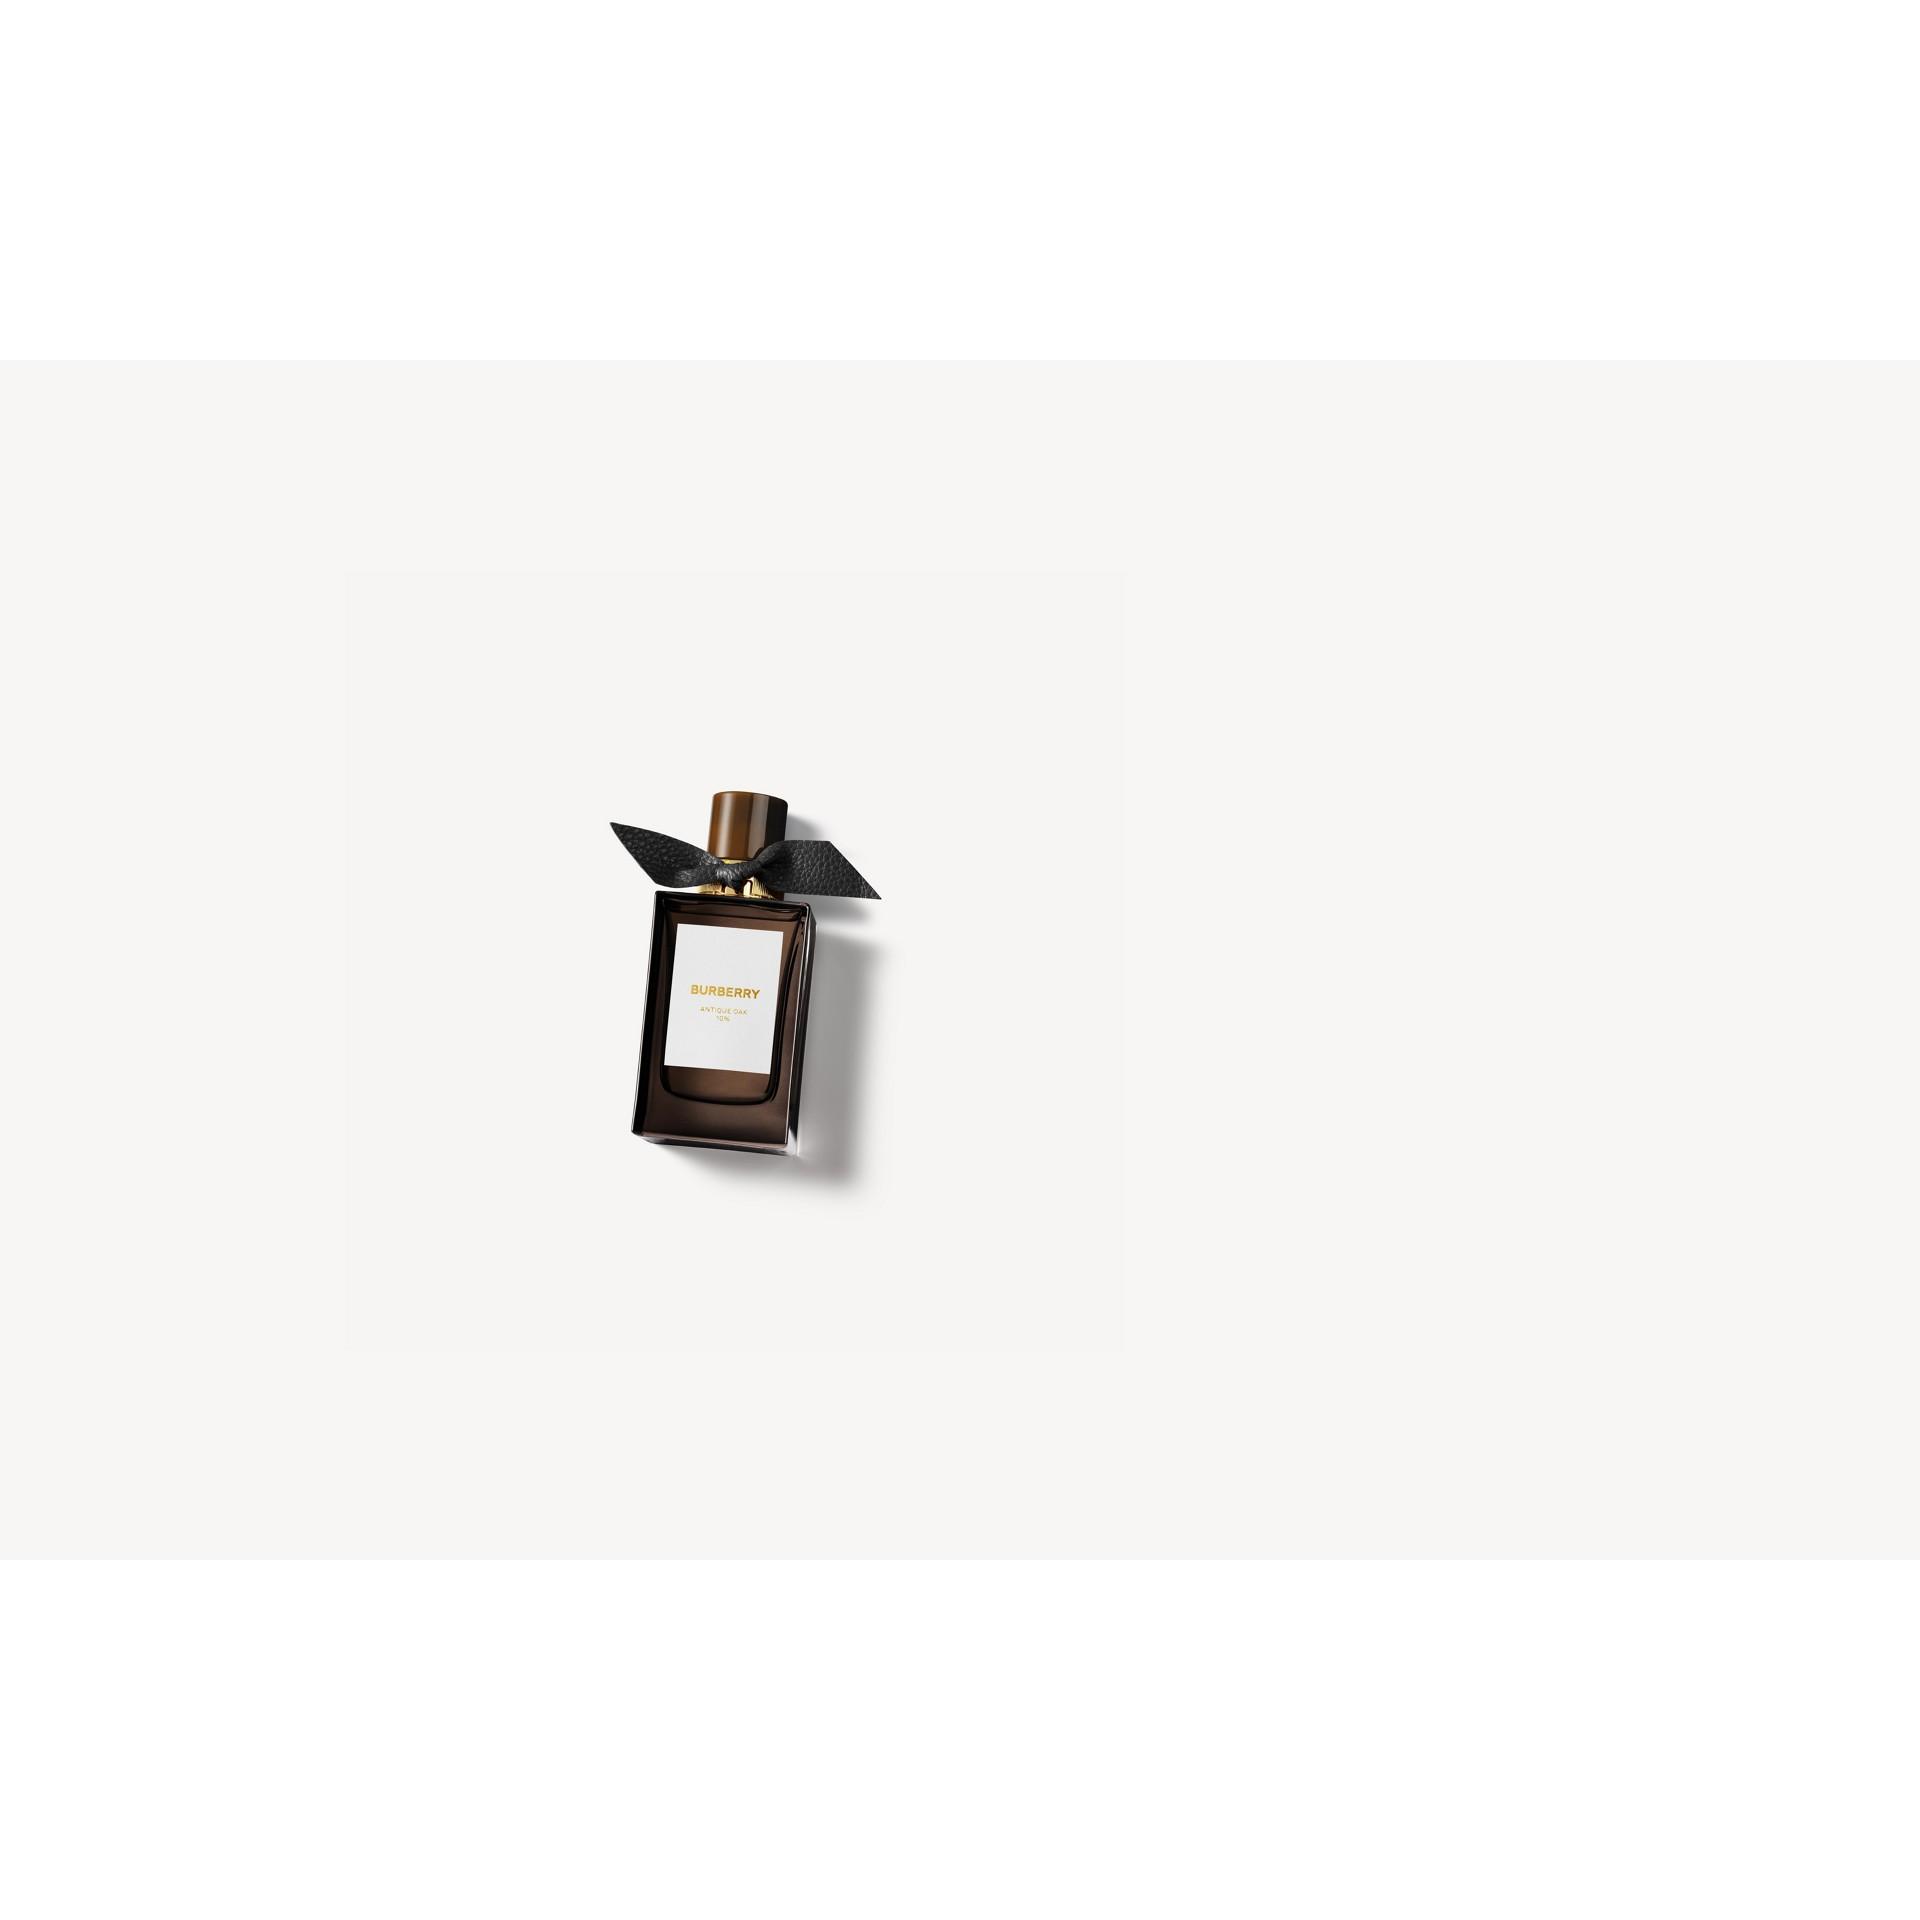 Burberry Signatures Antique Oak Eau de Parfum 100ml | Burberry United Kingdom - gallery image 1